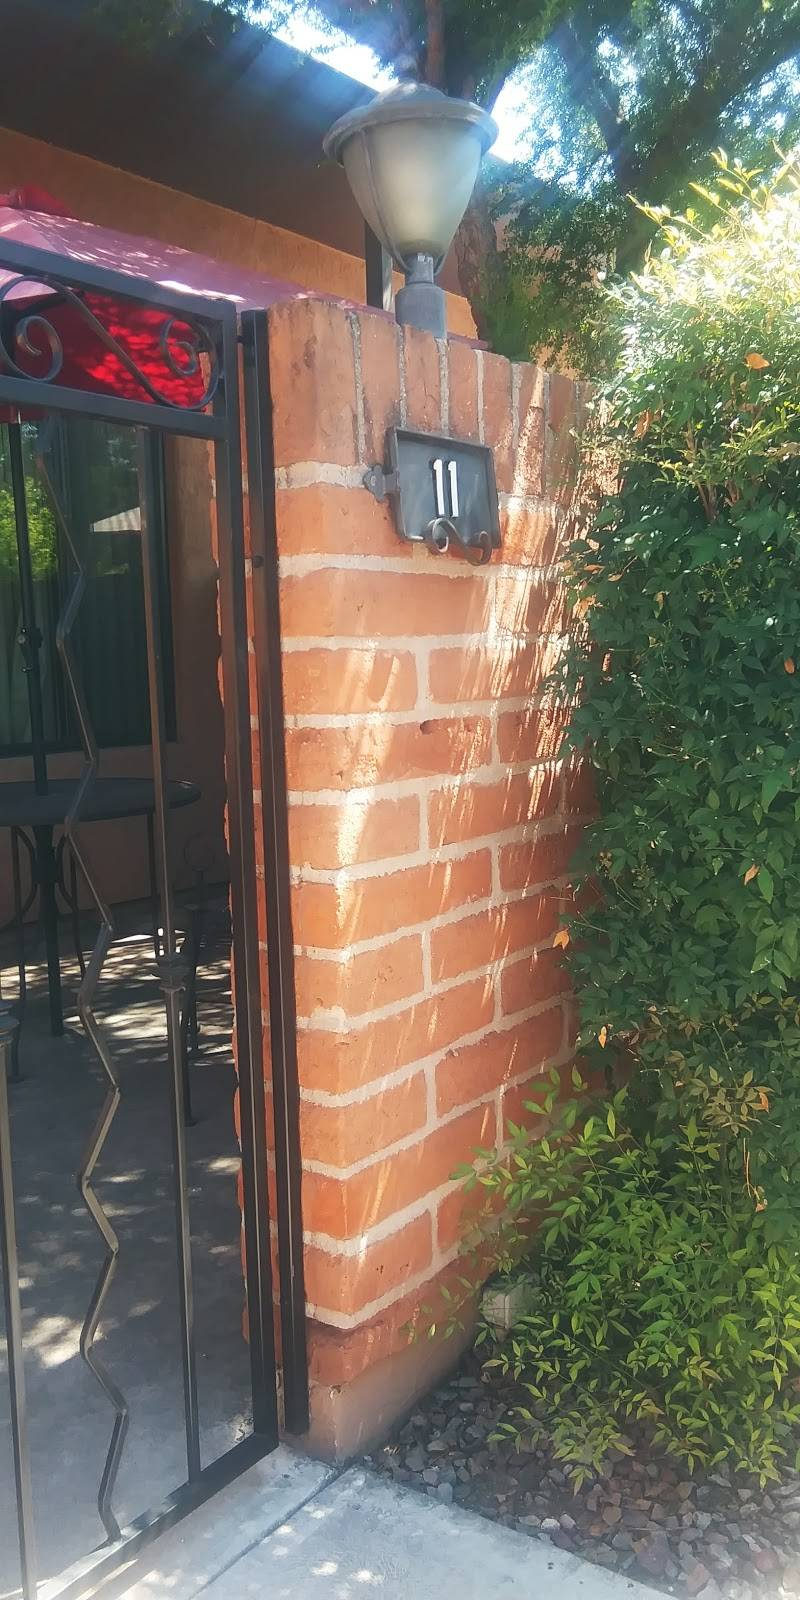 Riverside Suites - real estate agency    Photo 8 of 10   Address: 1725 E Limberlost Dr, Tucson, AZ 85719, USA   Phone: (520) 202-2210